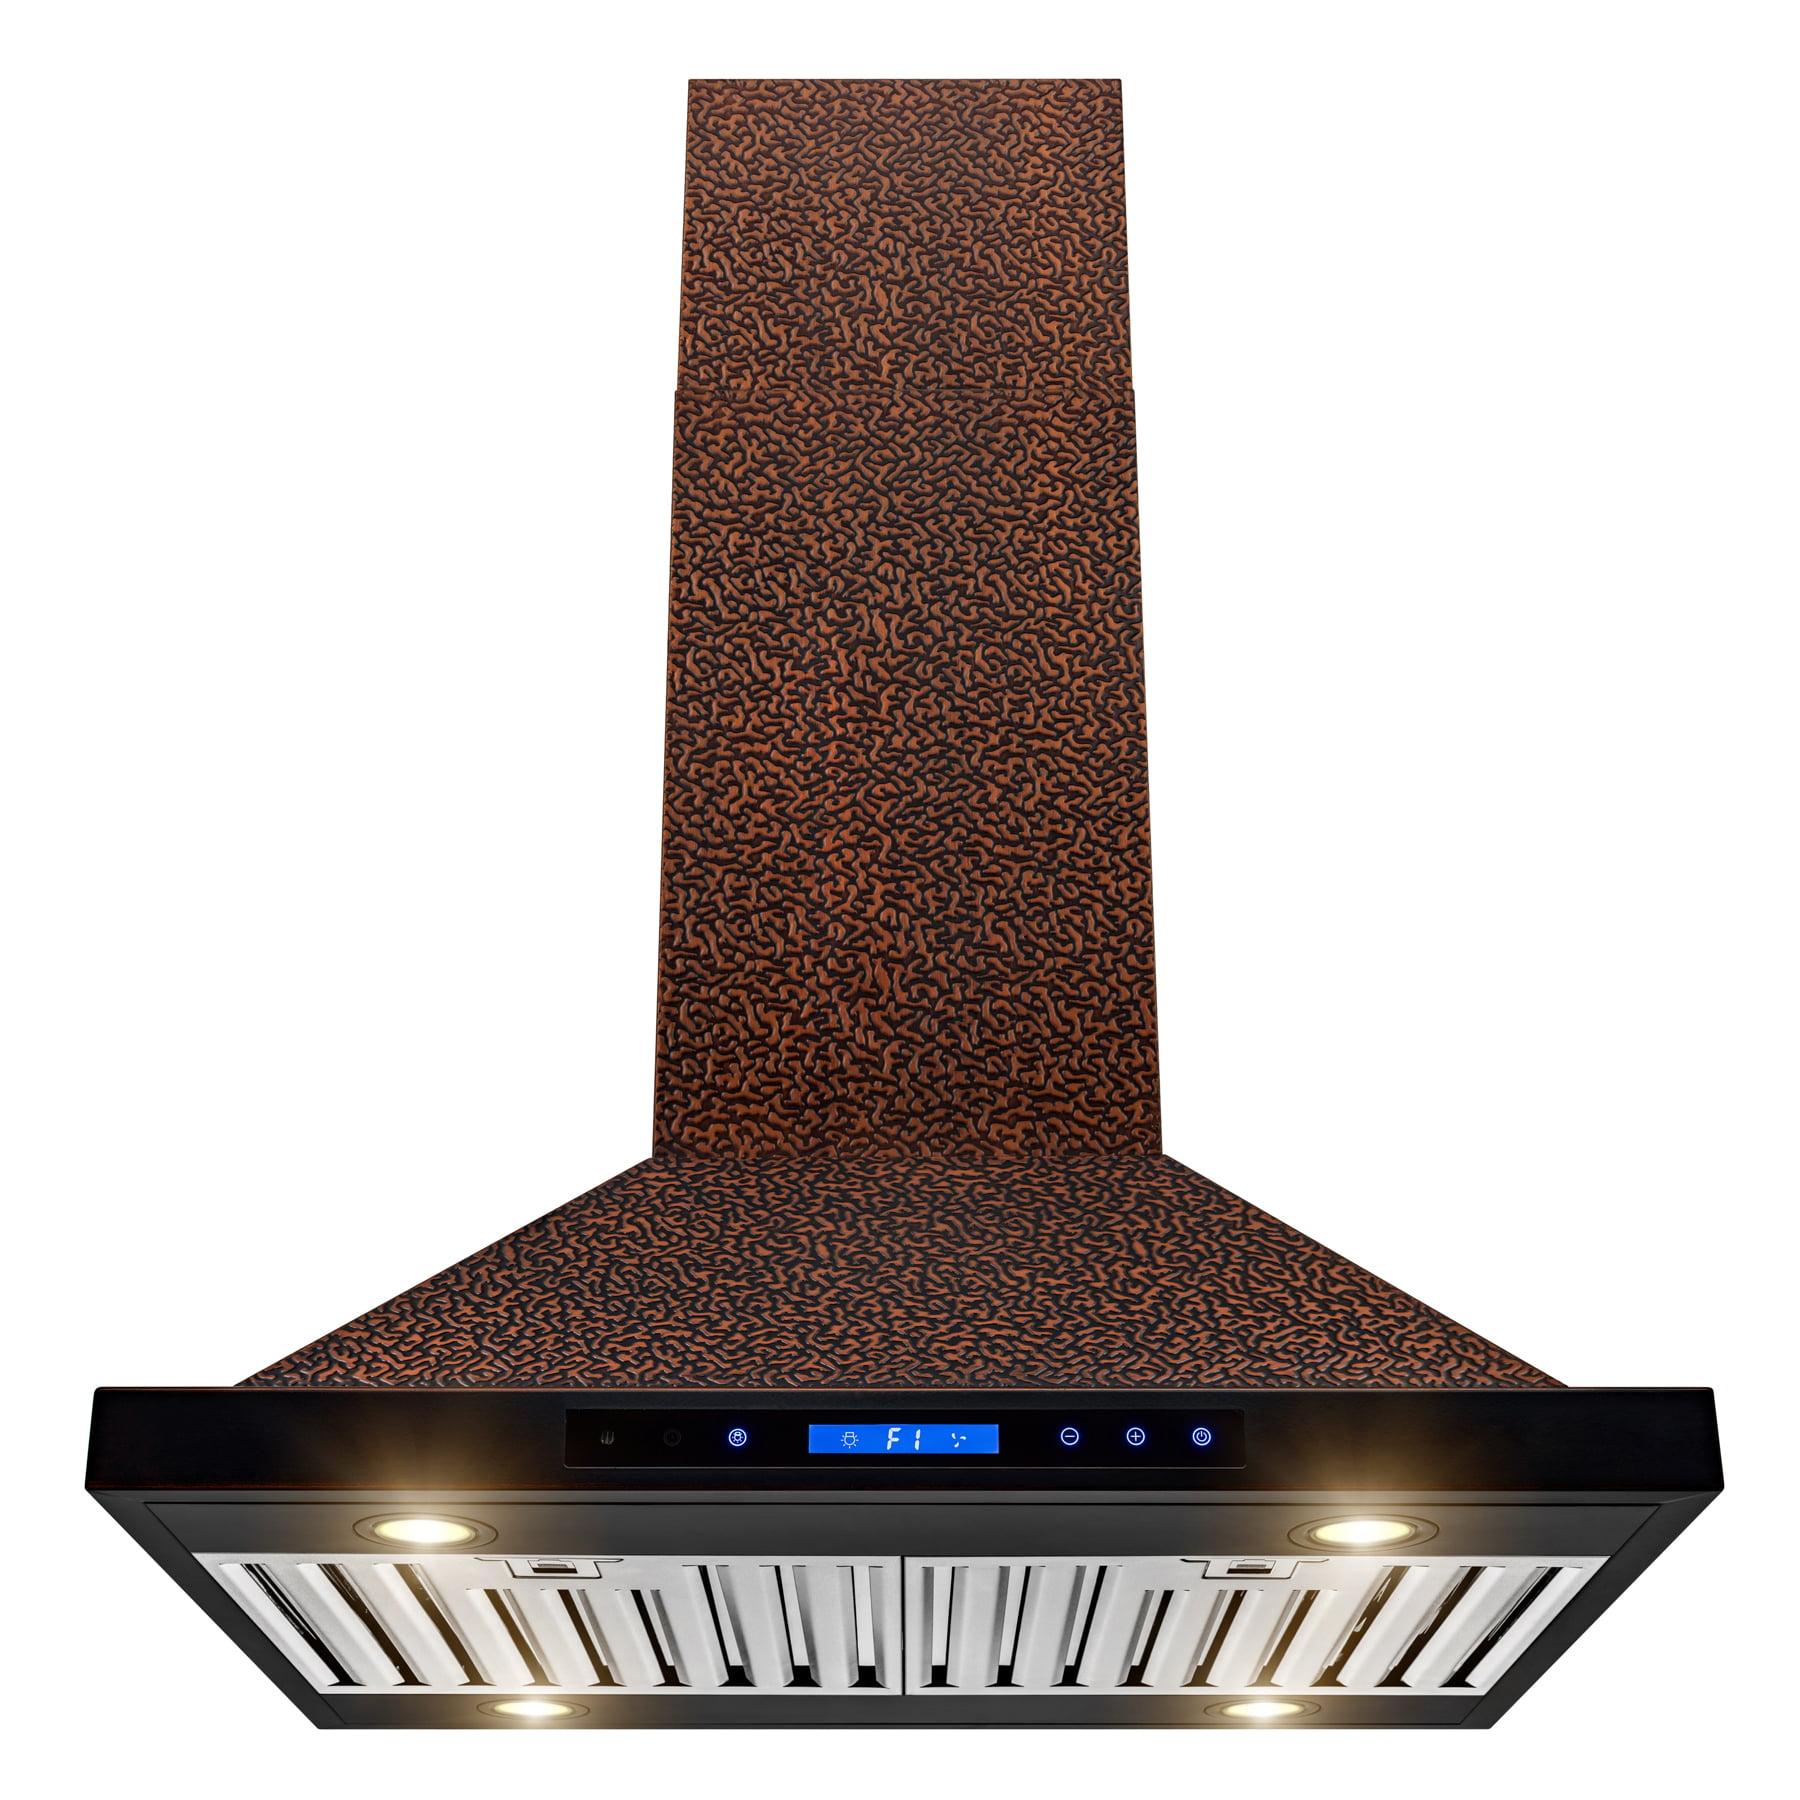 "AKDY Island Mount Range Hood –30"" Embossed Copper Hood Fan for Kitchen – 4-Speed Professional Quiet Motor – Touch Control Panel – Modern Design – Dishwasher-Safe Baffle Filters"